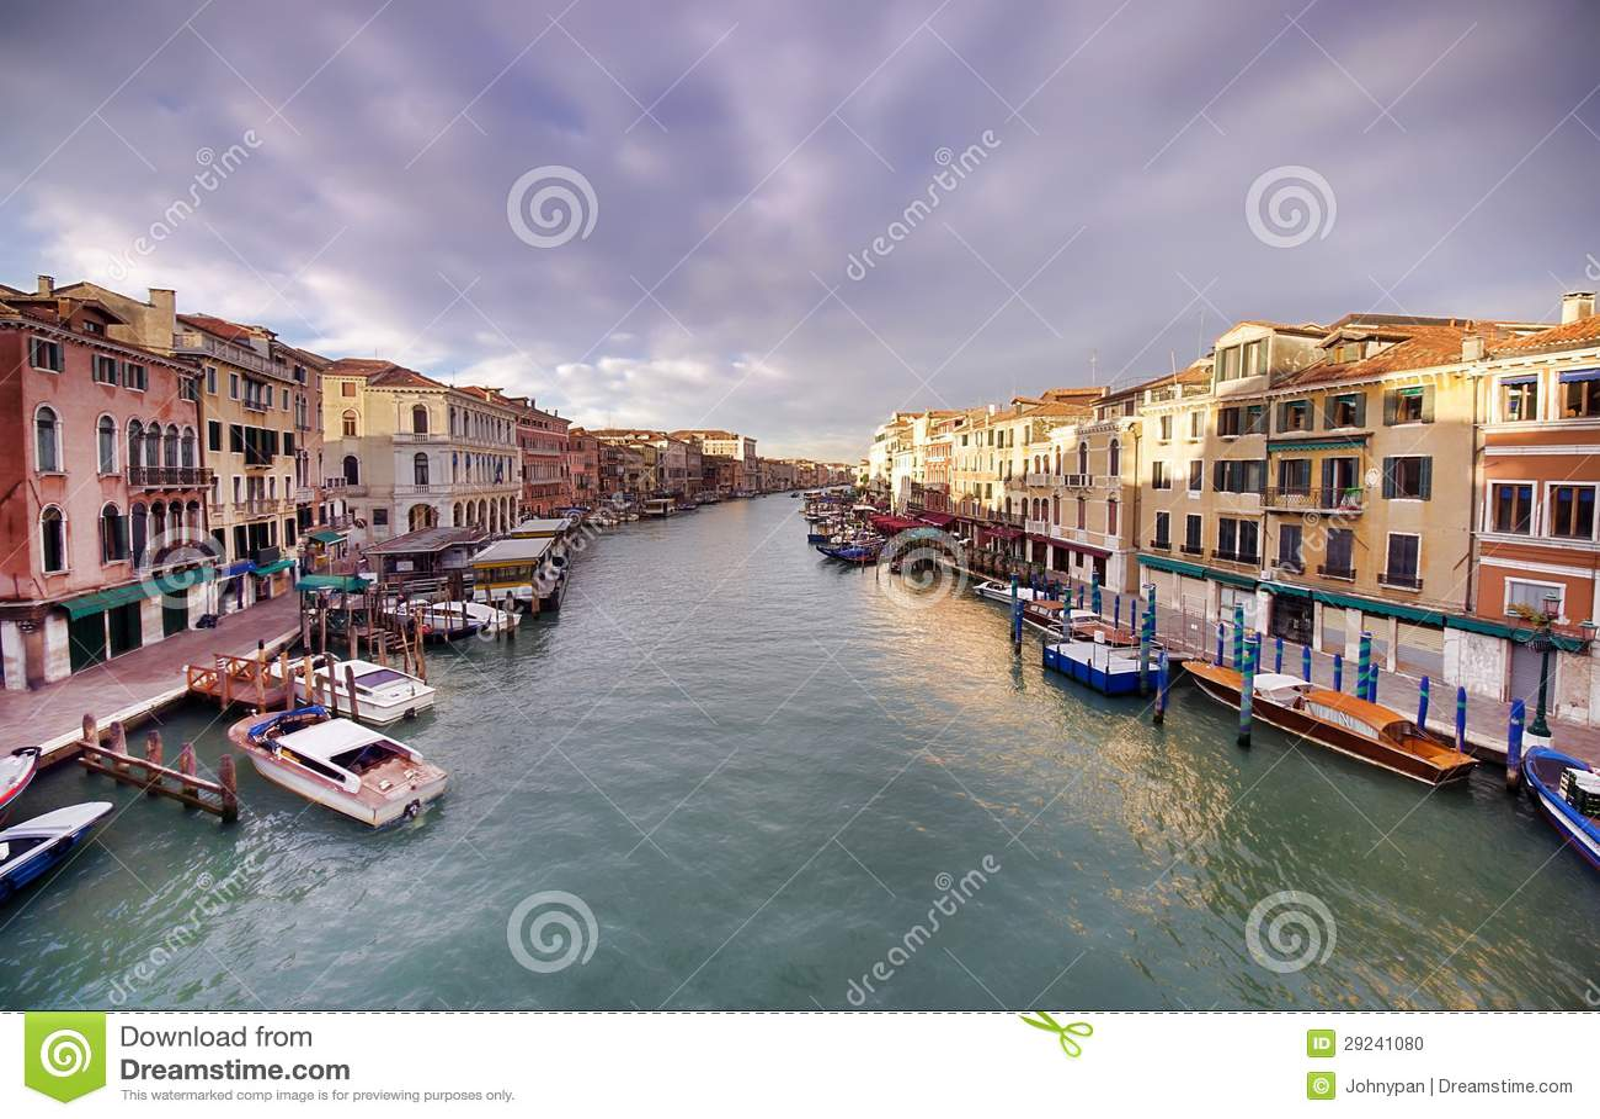 Download Canal grande de Veneza foto de stock. Imagem de gondola - 29241080